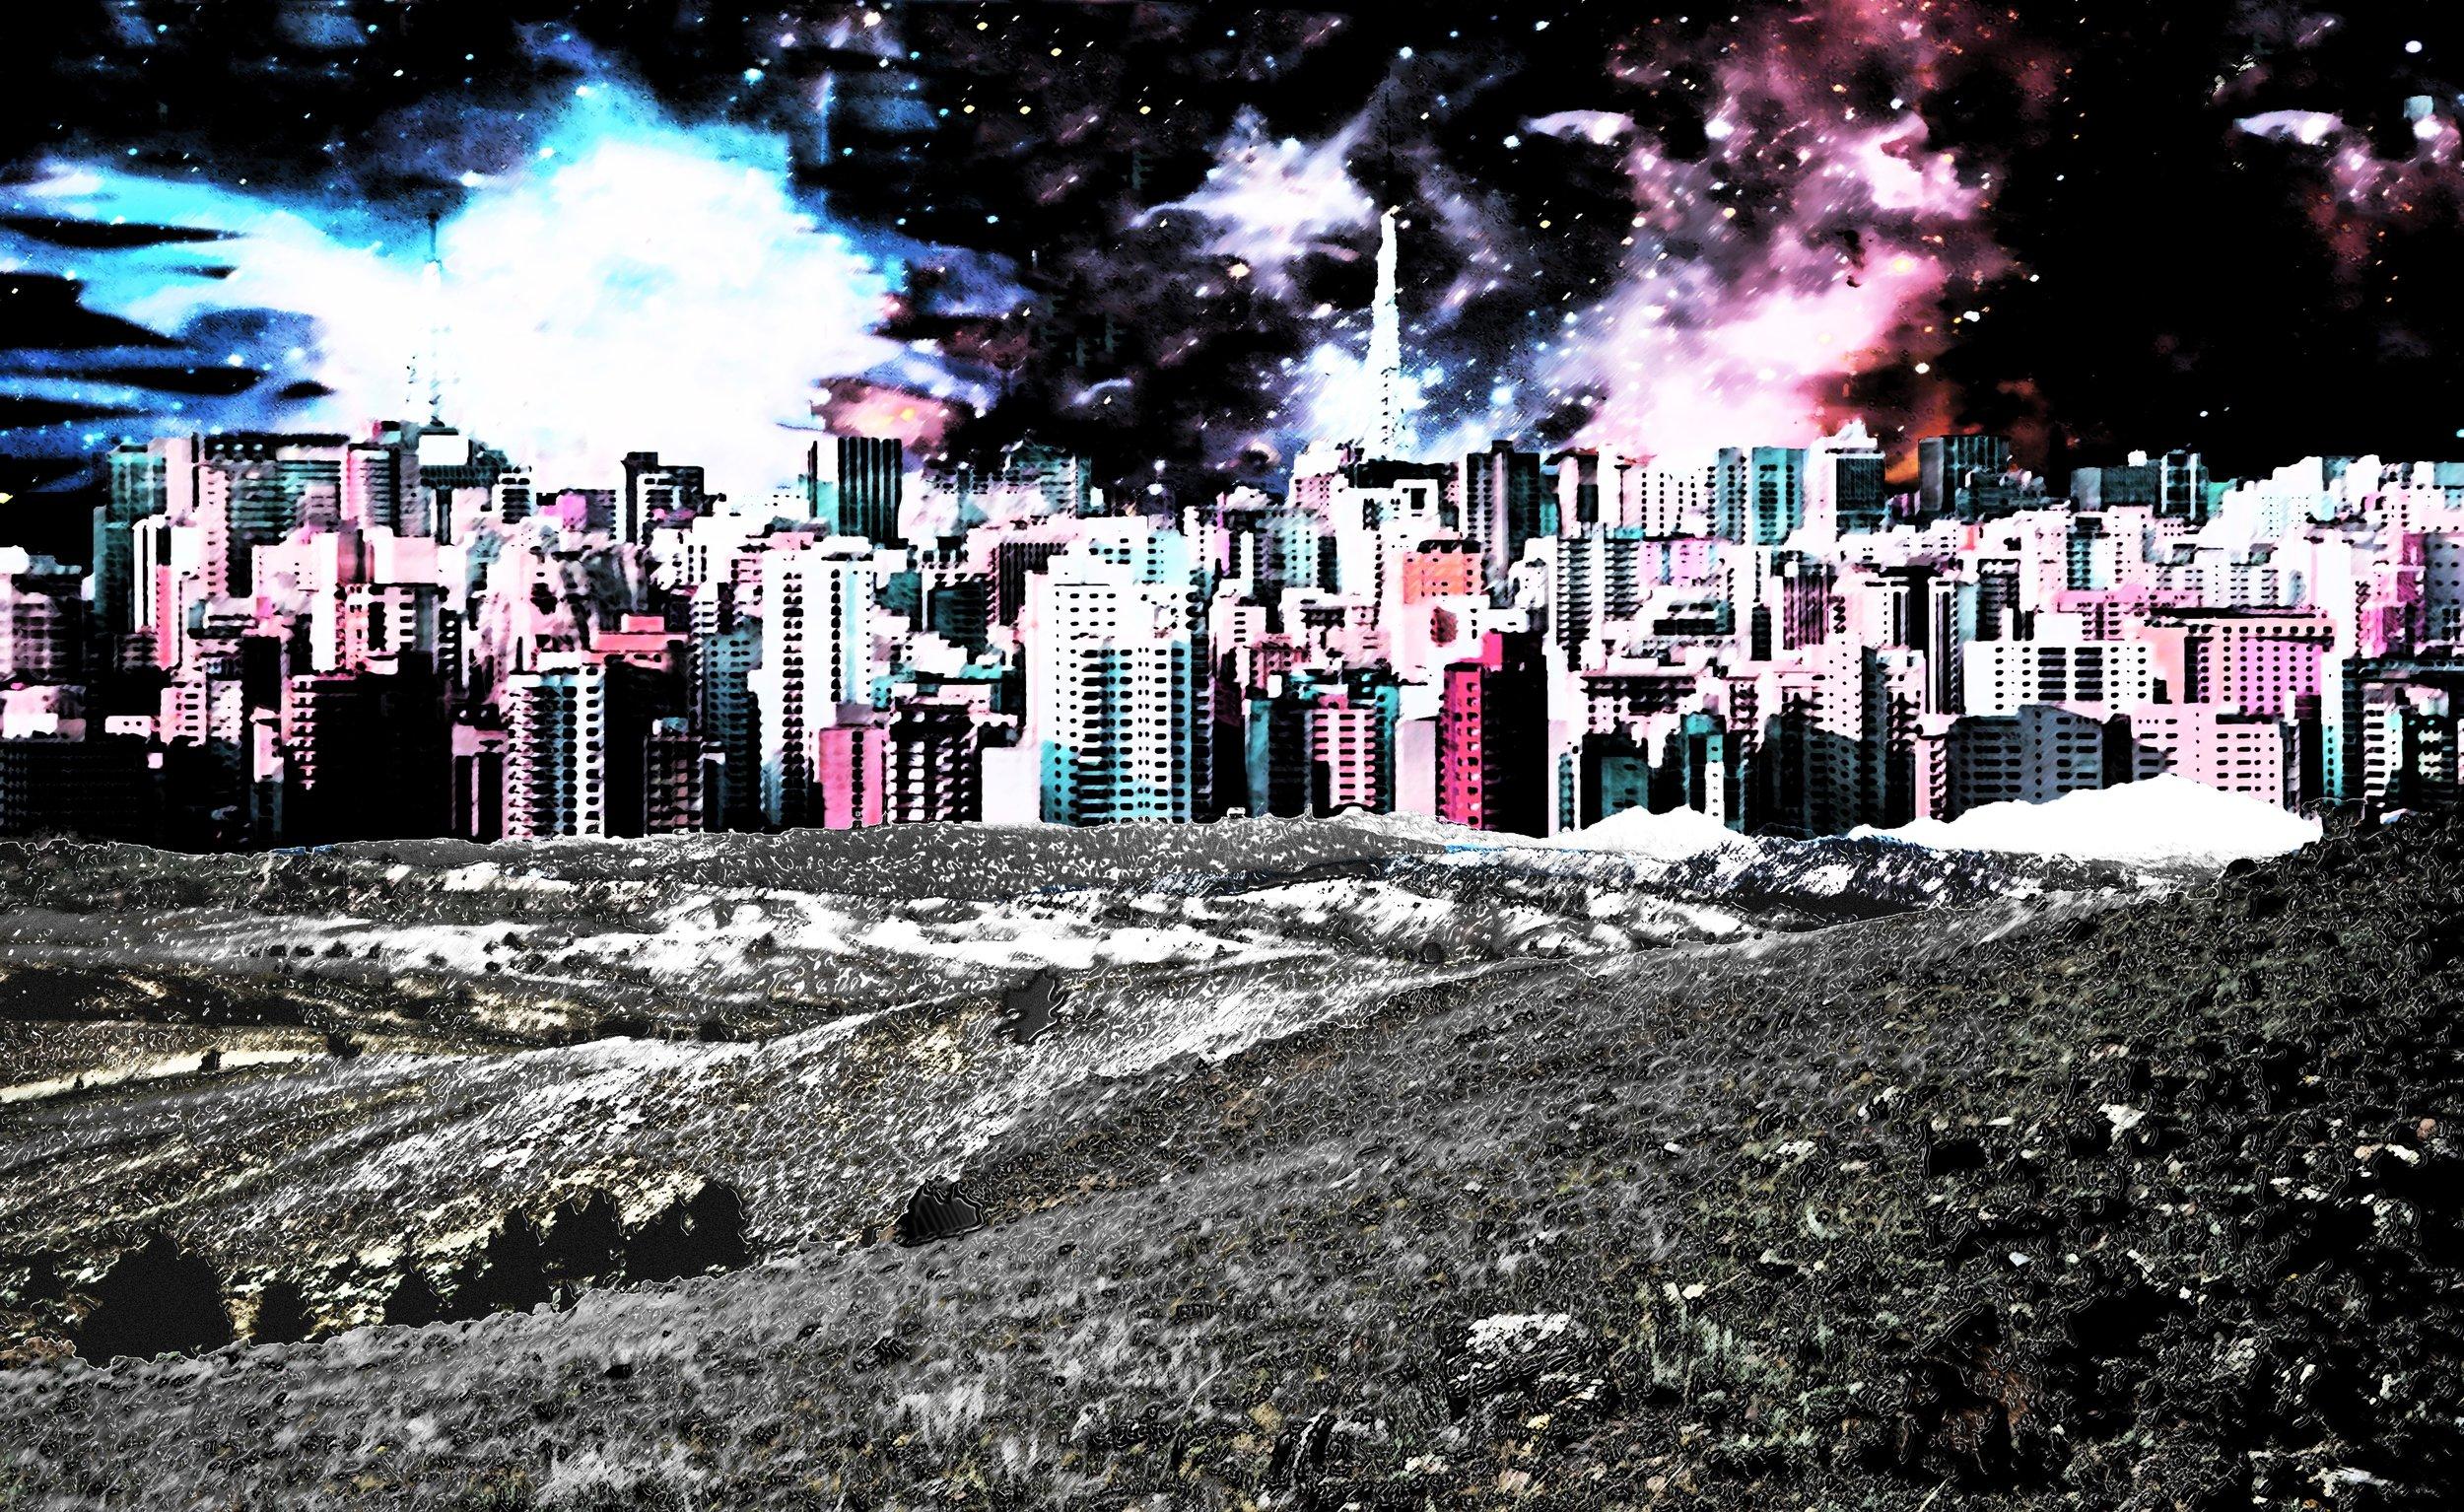 space city.jpg